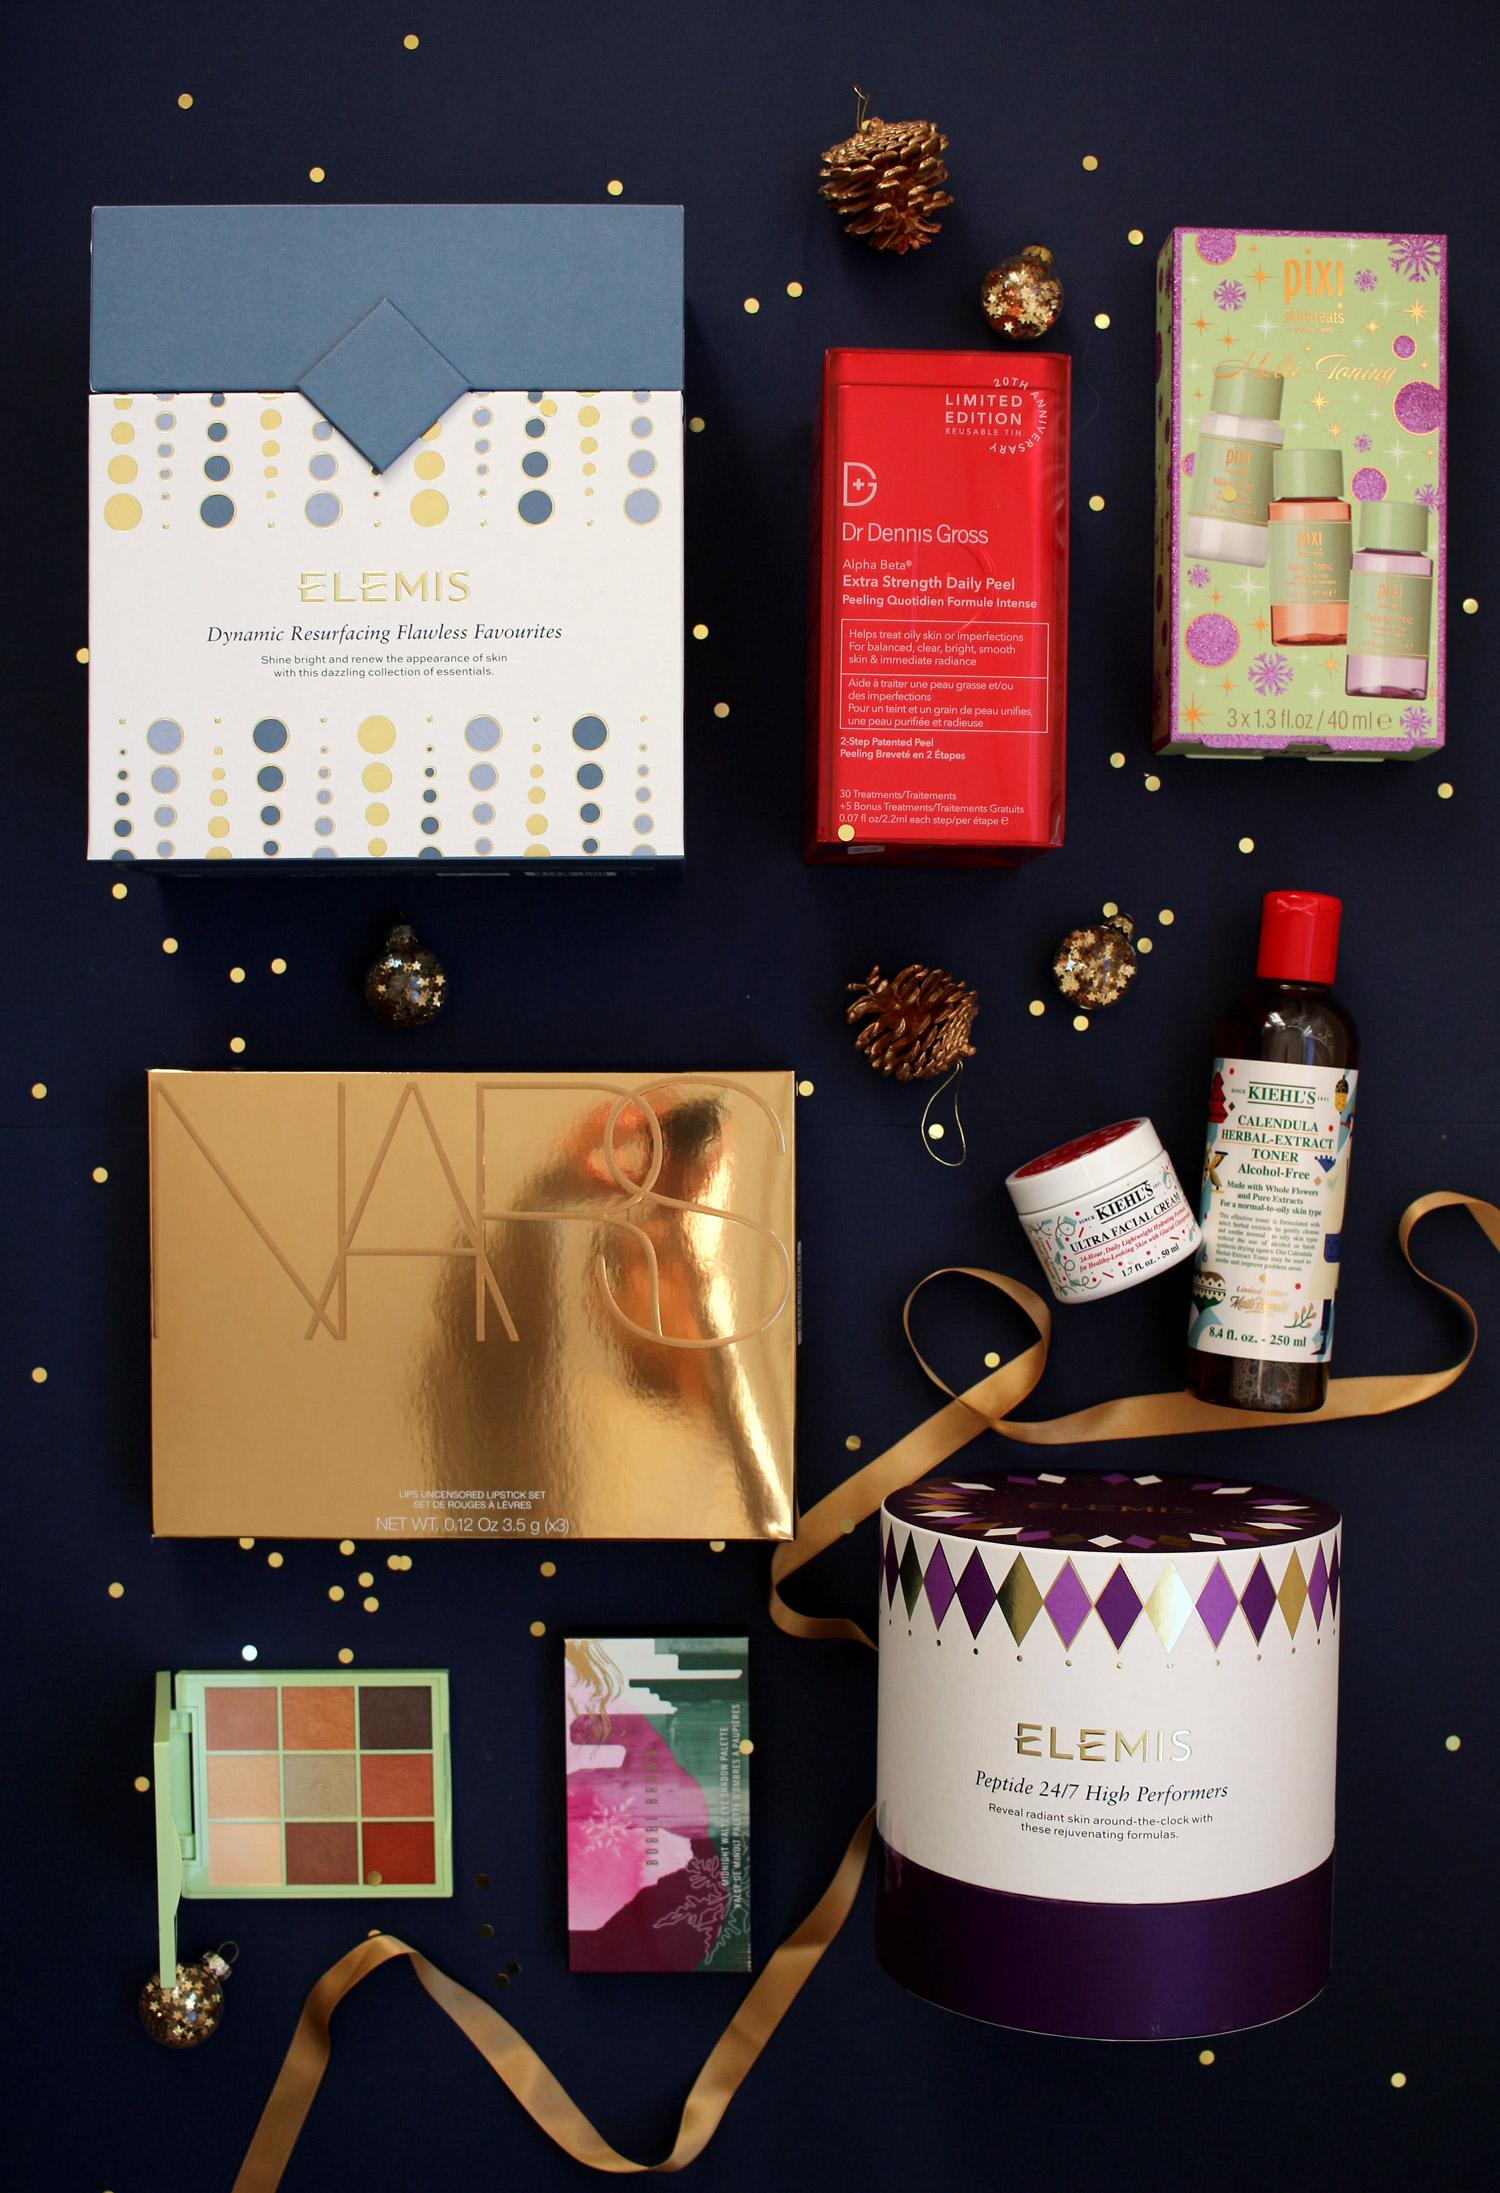 christmas-2020-beauty-gift-guide-skincare-makeup-elemis-bobbi-brown-kiehls